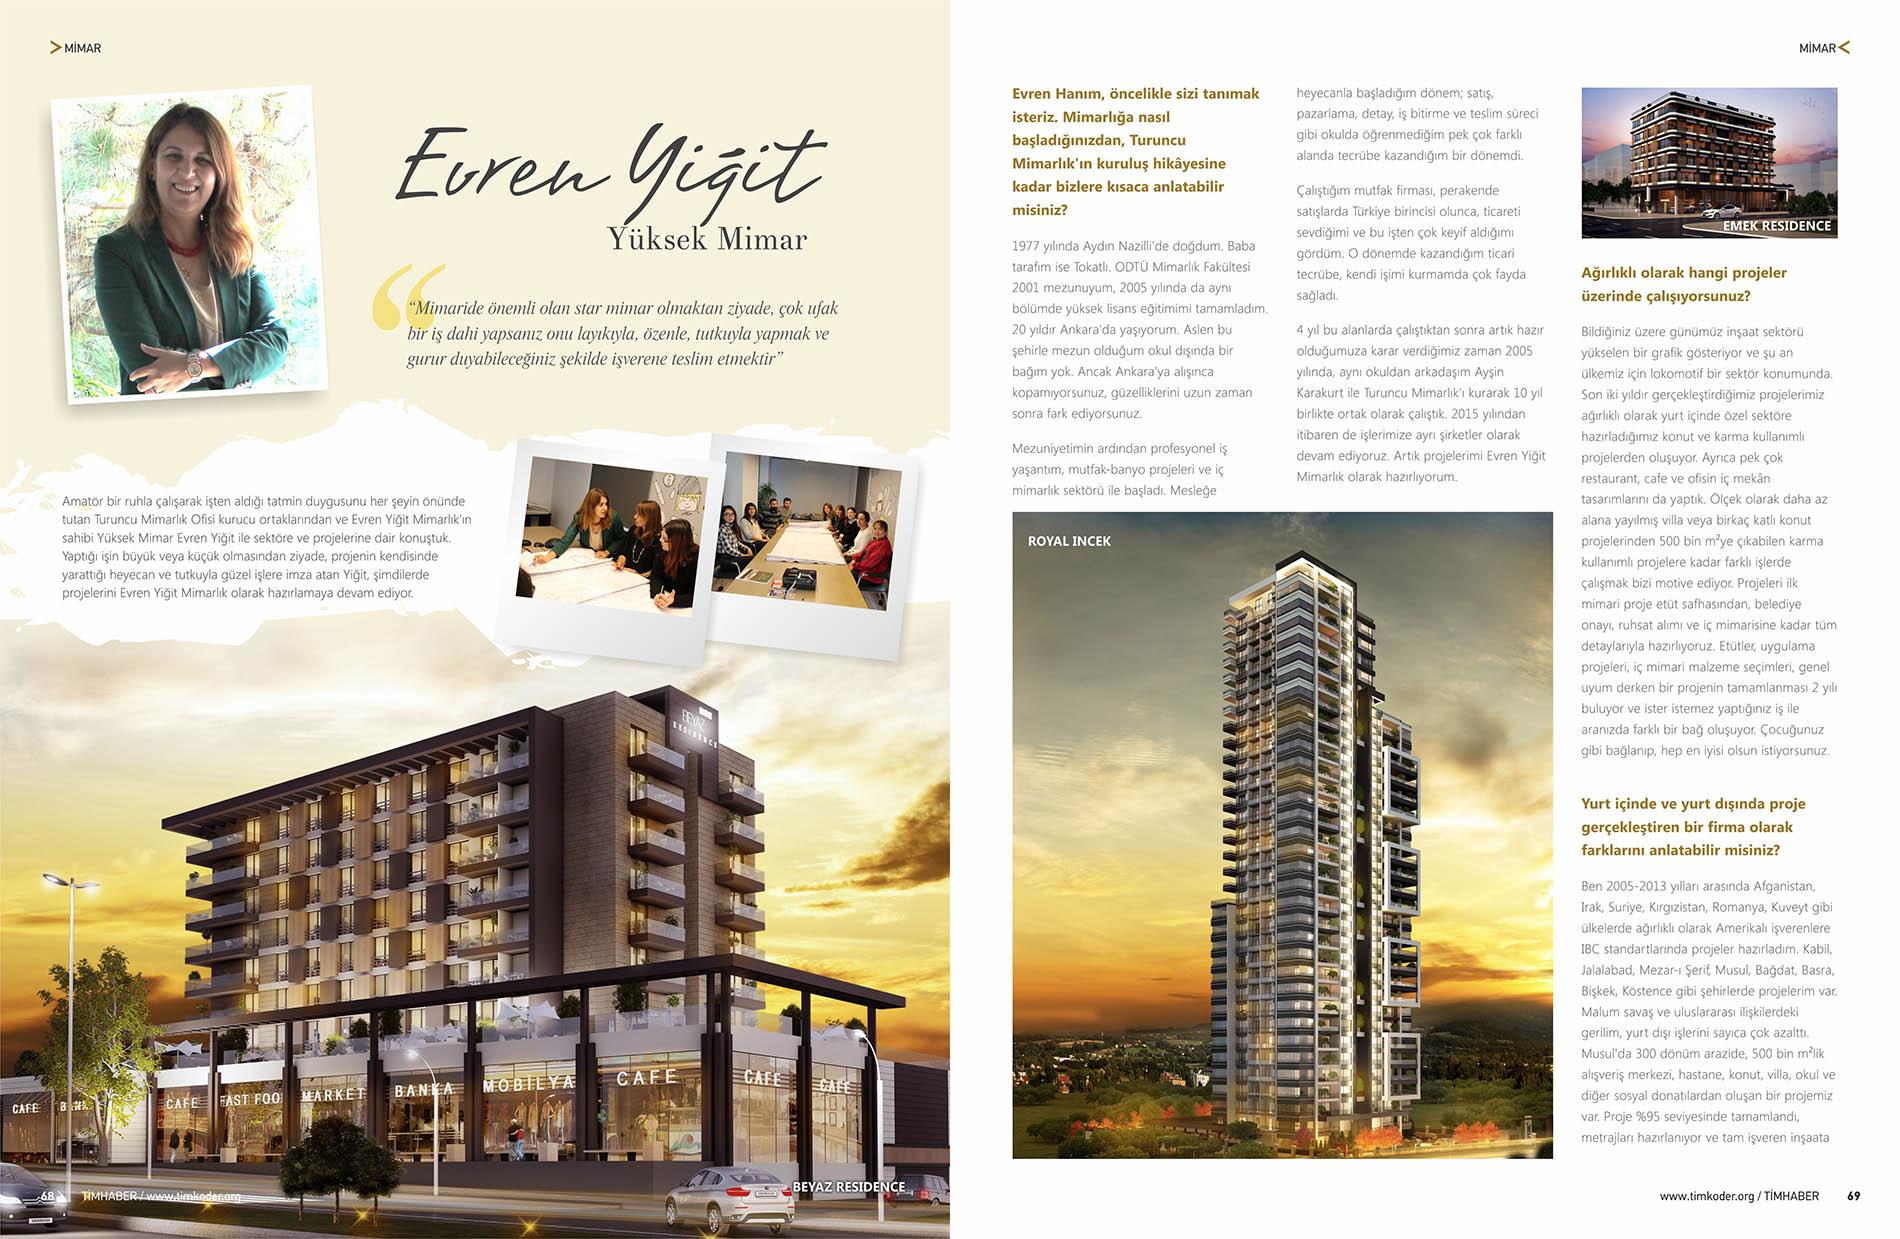 Evren Yiğit   TimHaber Magazine interviewed Evren Yiğit on its TIMKODER-KOSGEB Project Special Issue   Sıradışı Digital